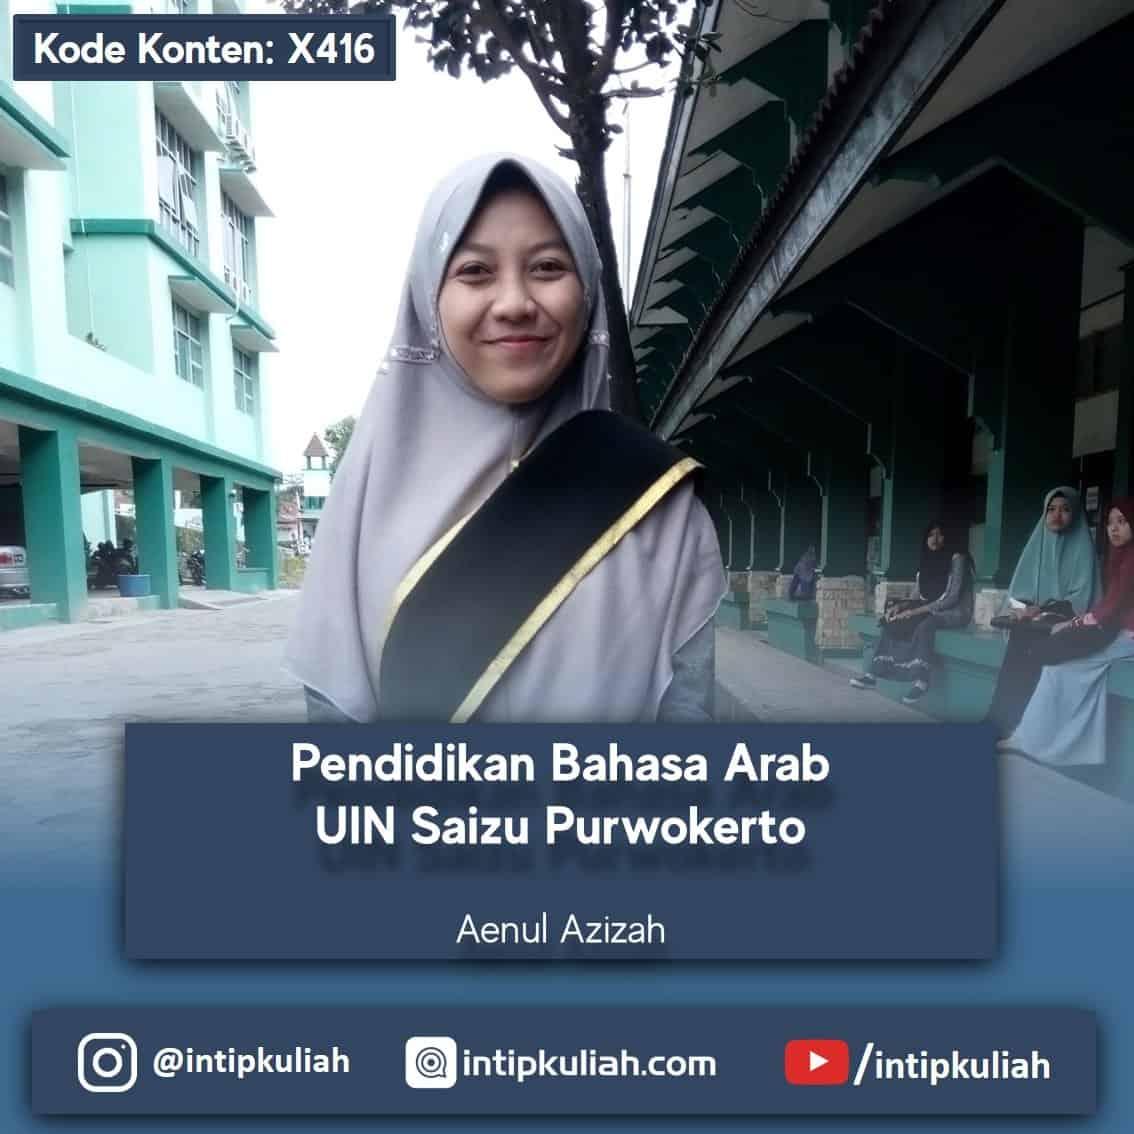 Pendidikan Bahasa Arab UIN Saizu Purwokerto (Aenul)